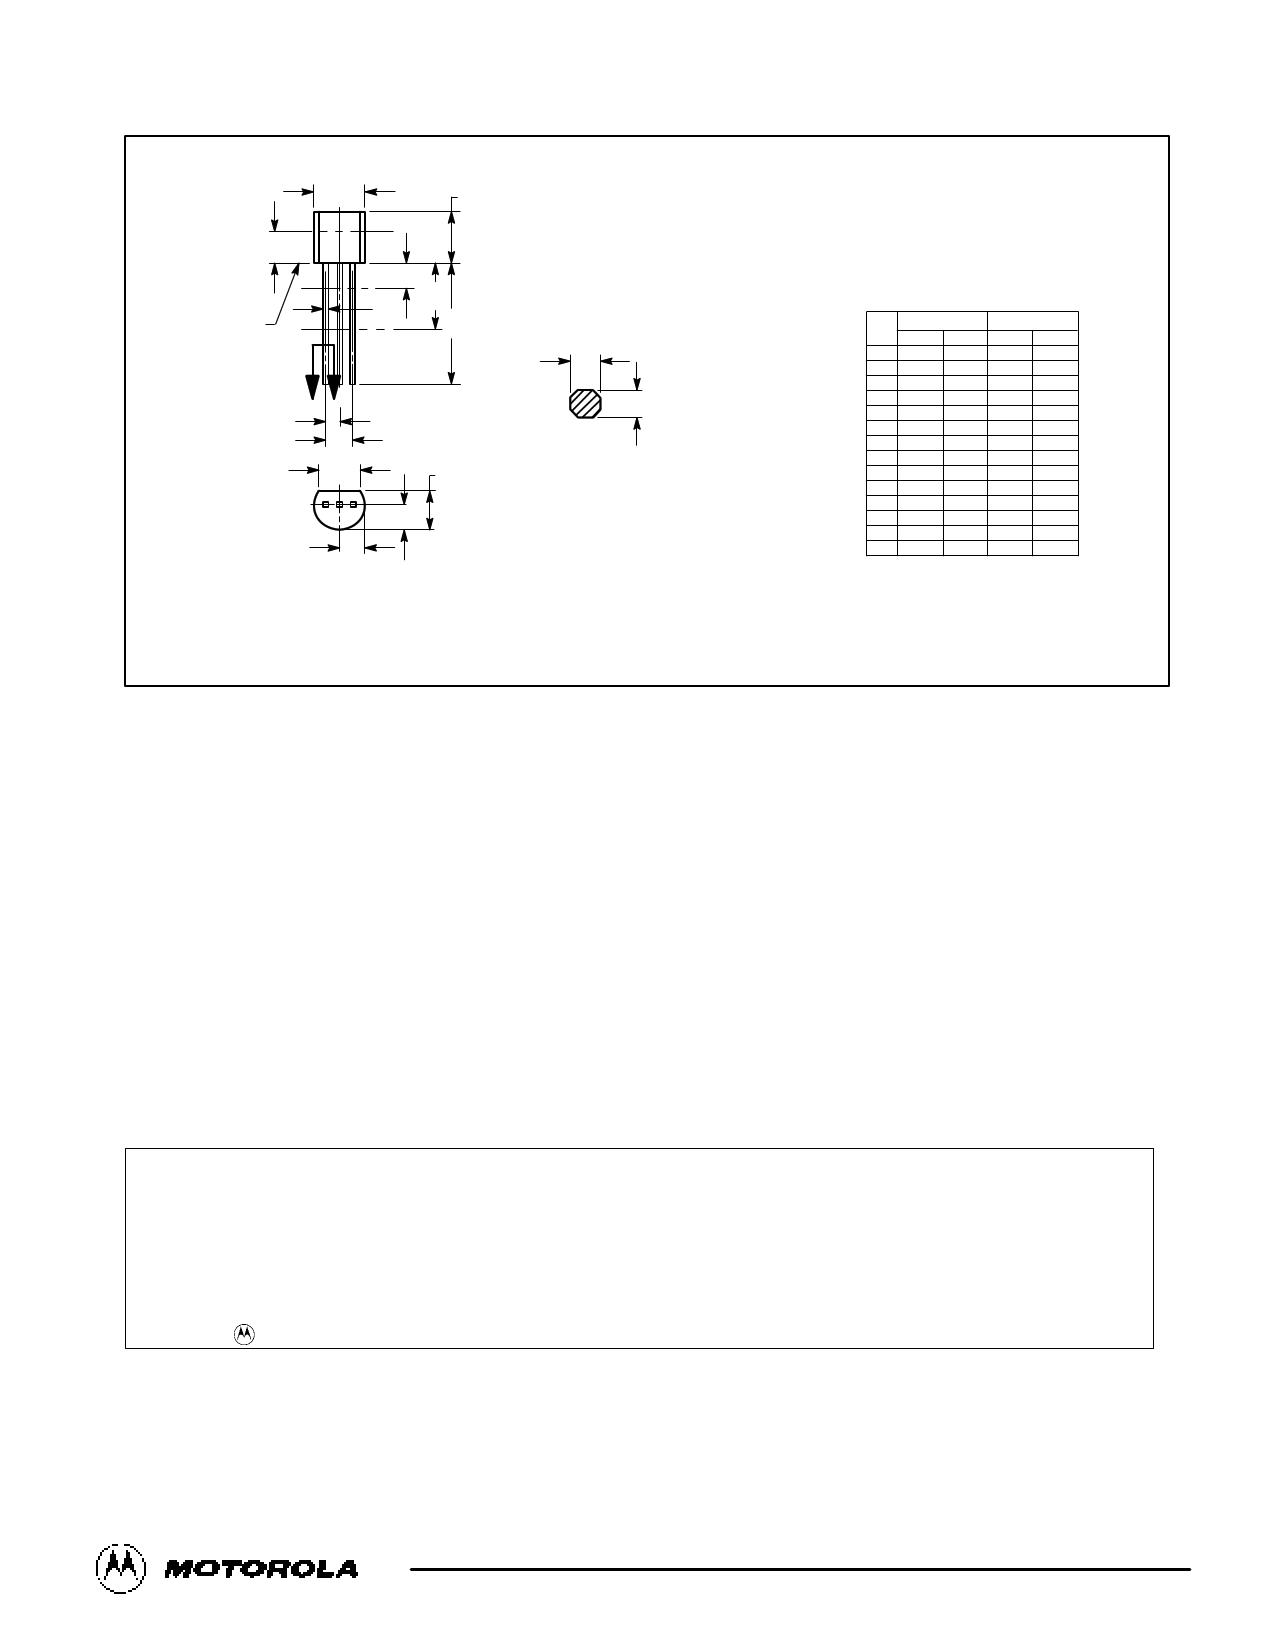 BC550B pdf, 반도체, 판매, 대치품